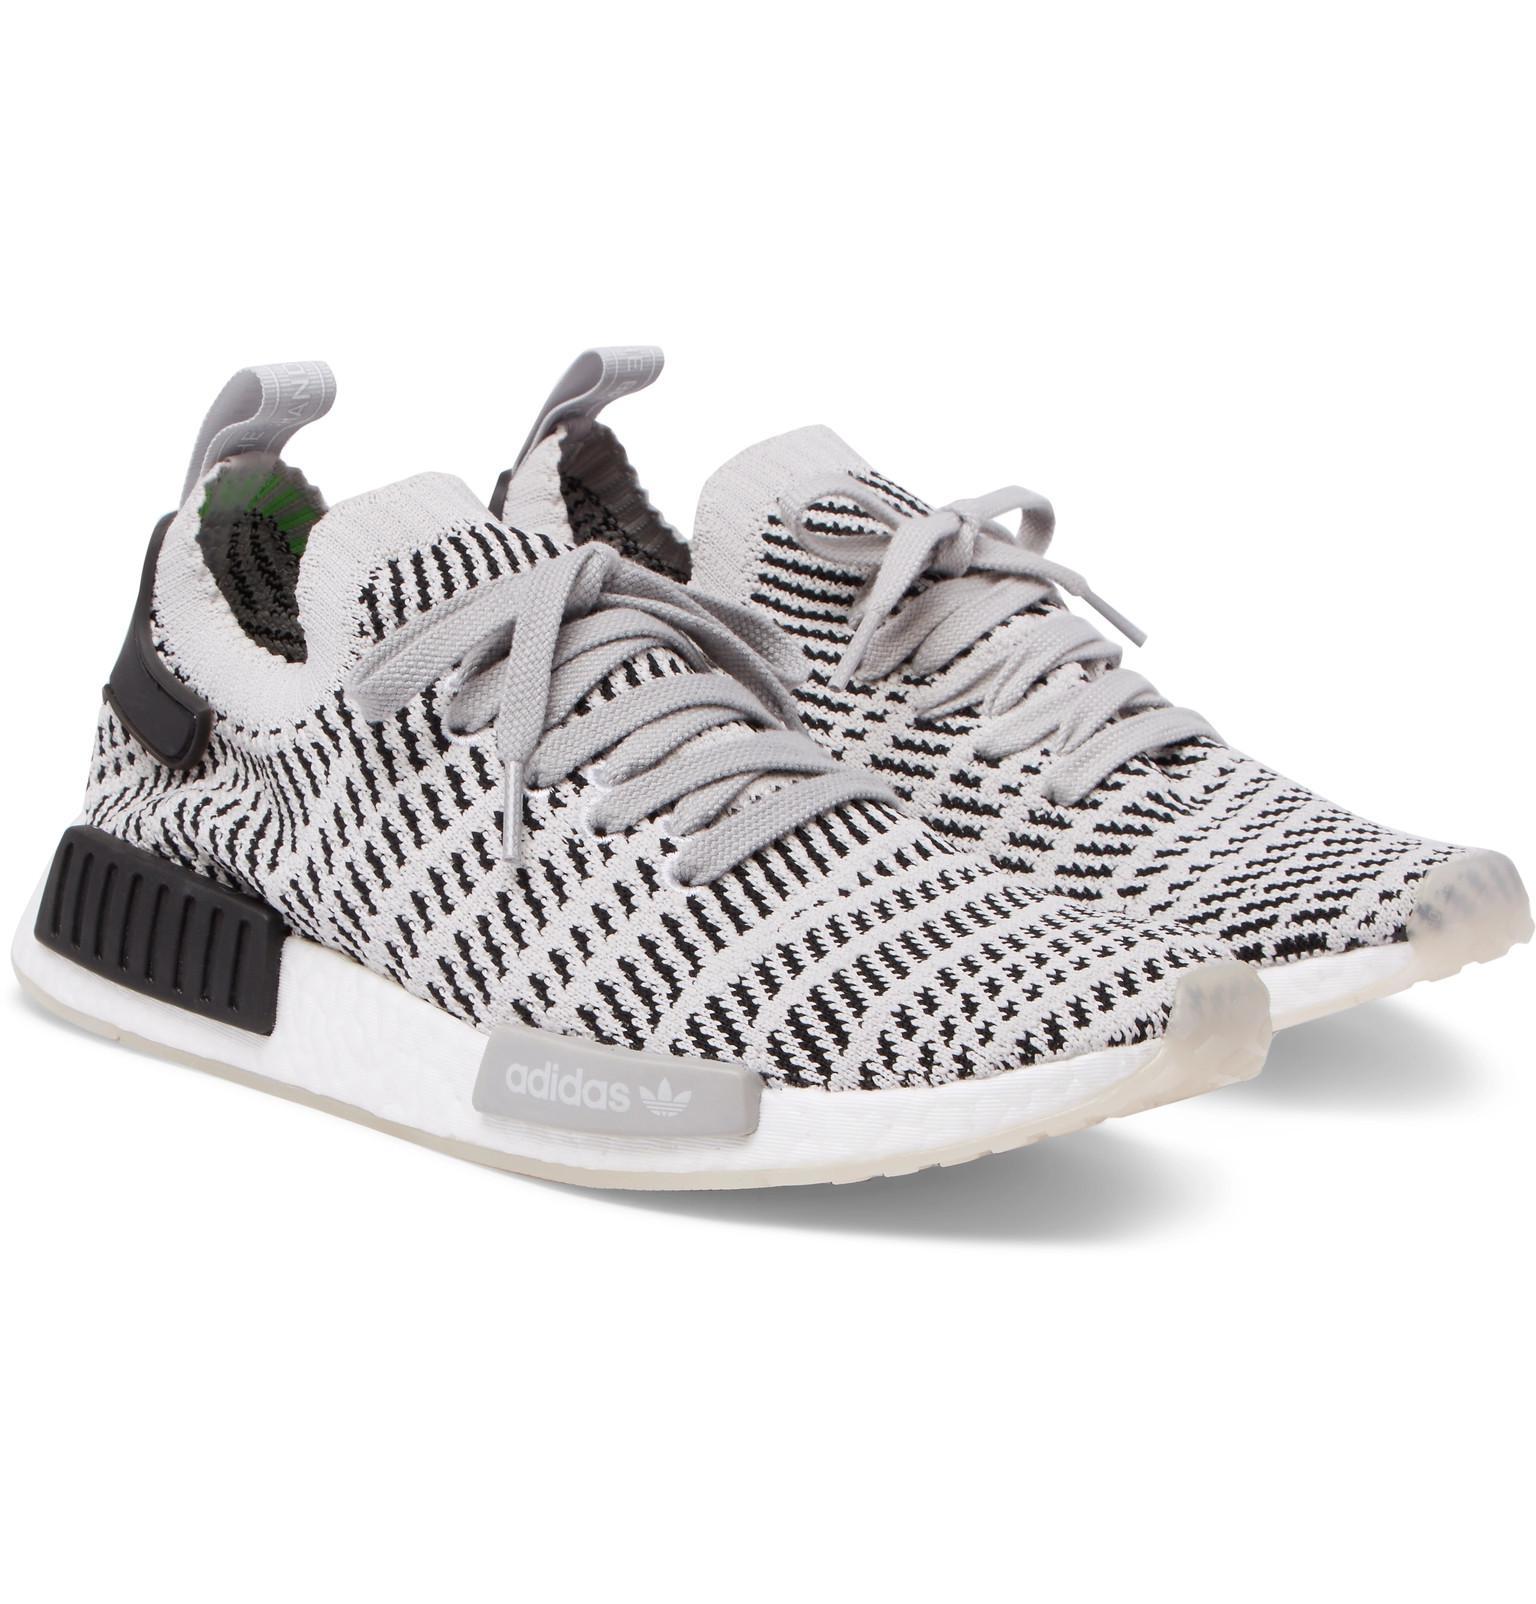 e2ca4f06375 Lyst - adidas Originals Nmd R1 Stealth Primeknit Sneakers in Gray ...